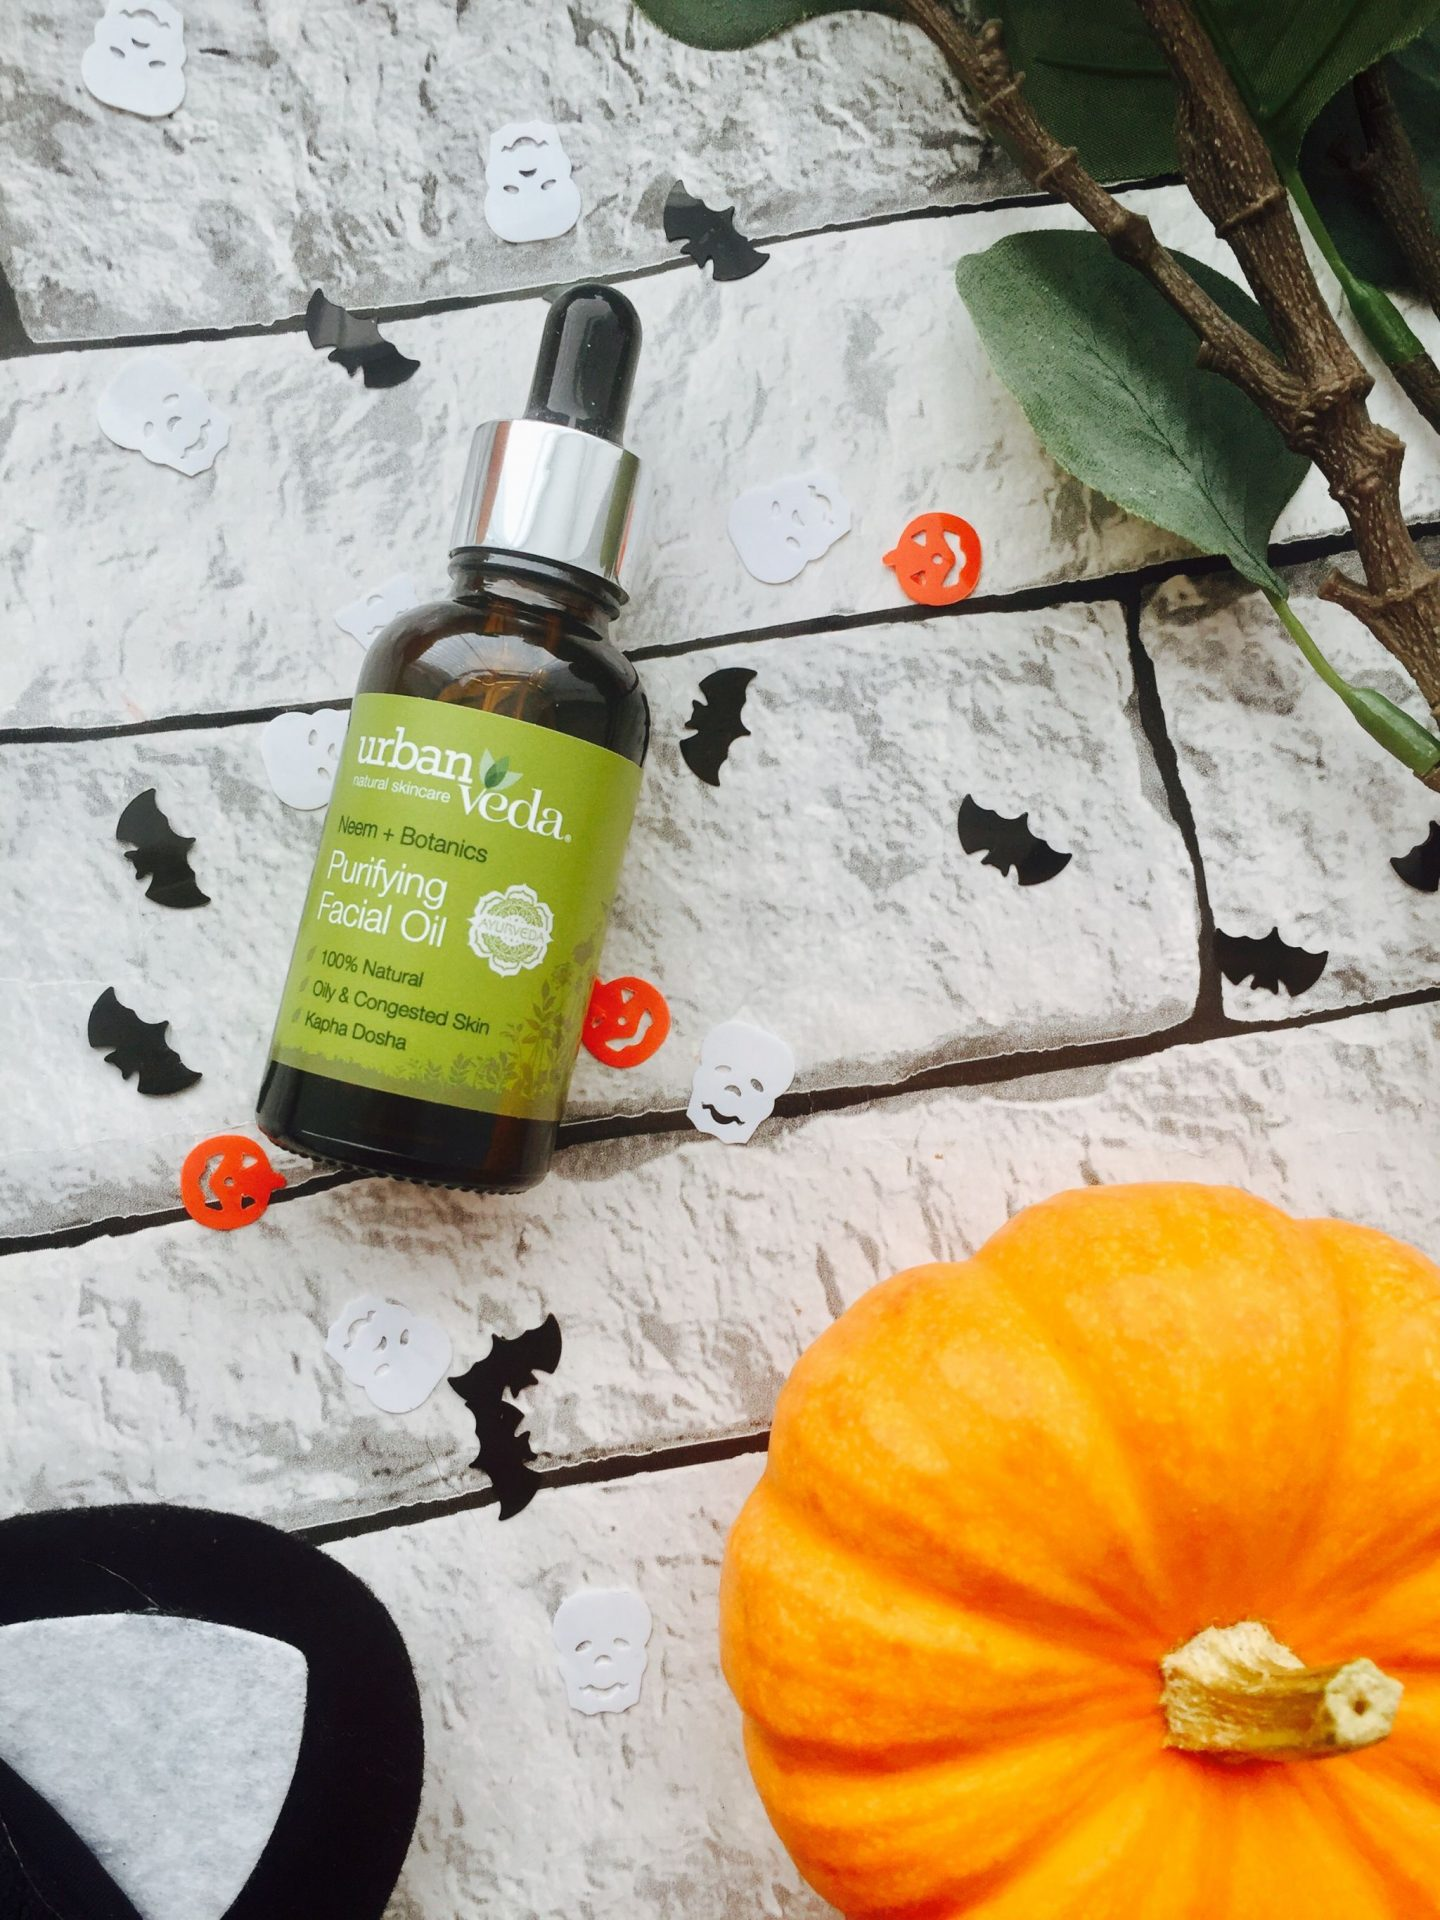 Urban Veda Facial Oil new release Pitta kapha dosha sensitive skin oily breakout skincare